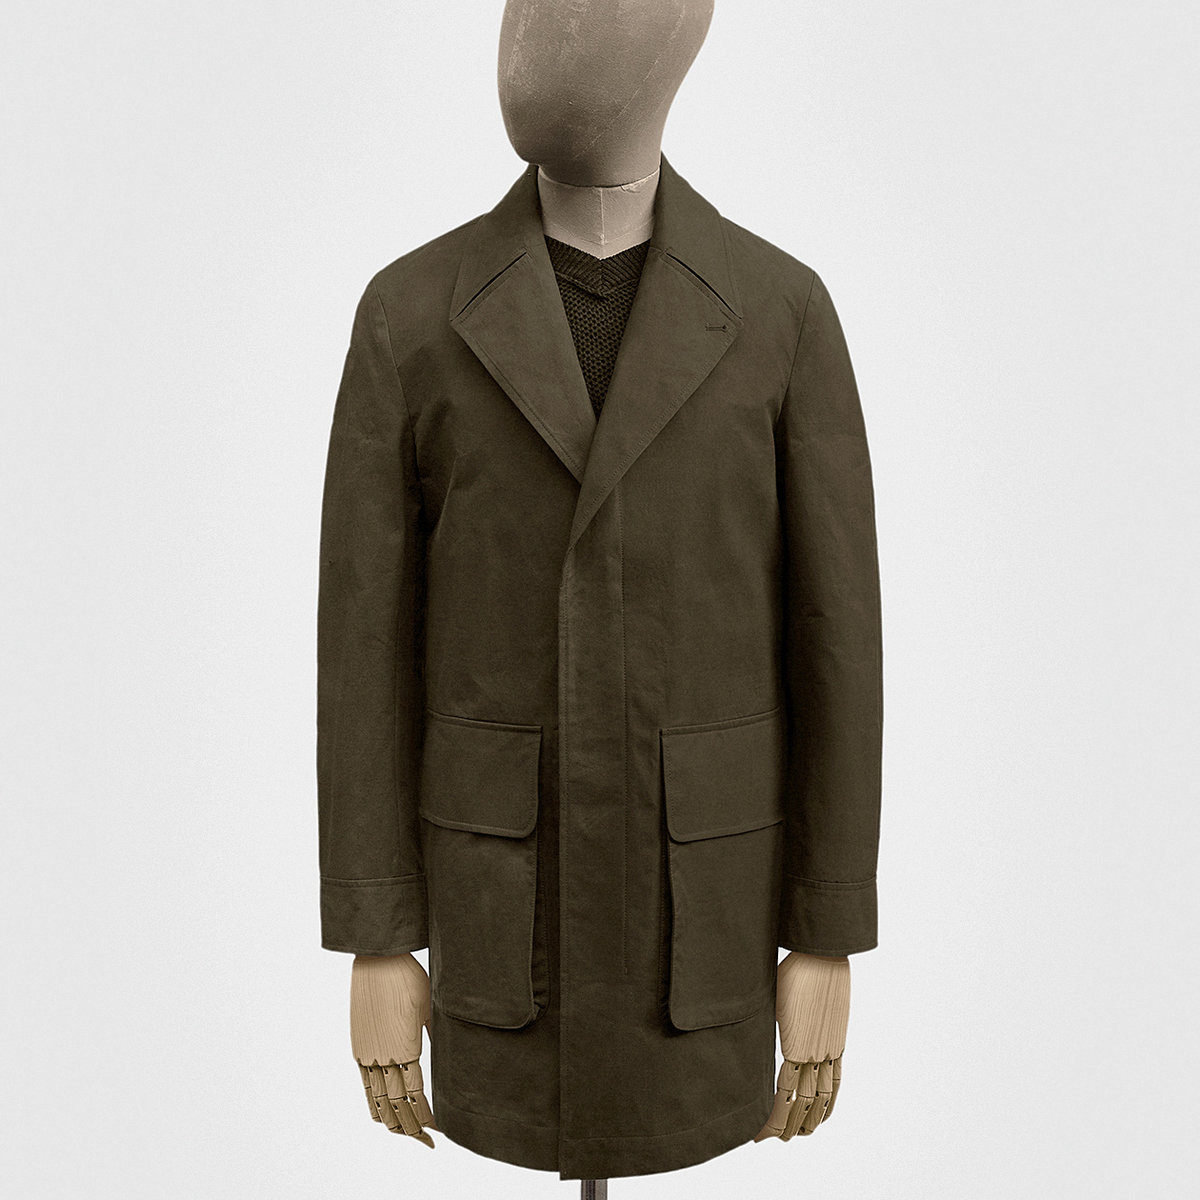 car-coat-cotton-staywax-olive-drab-1@2x.jpg